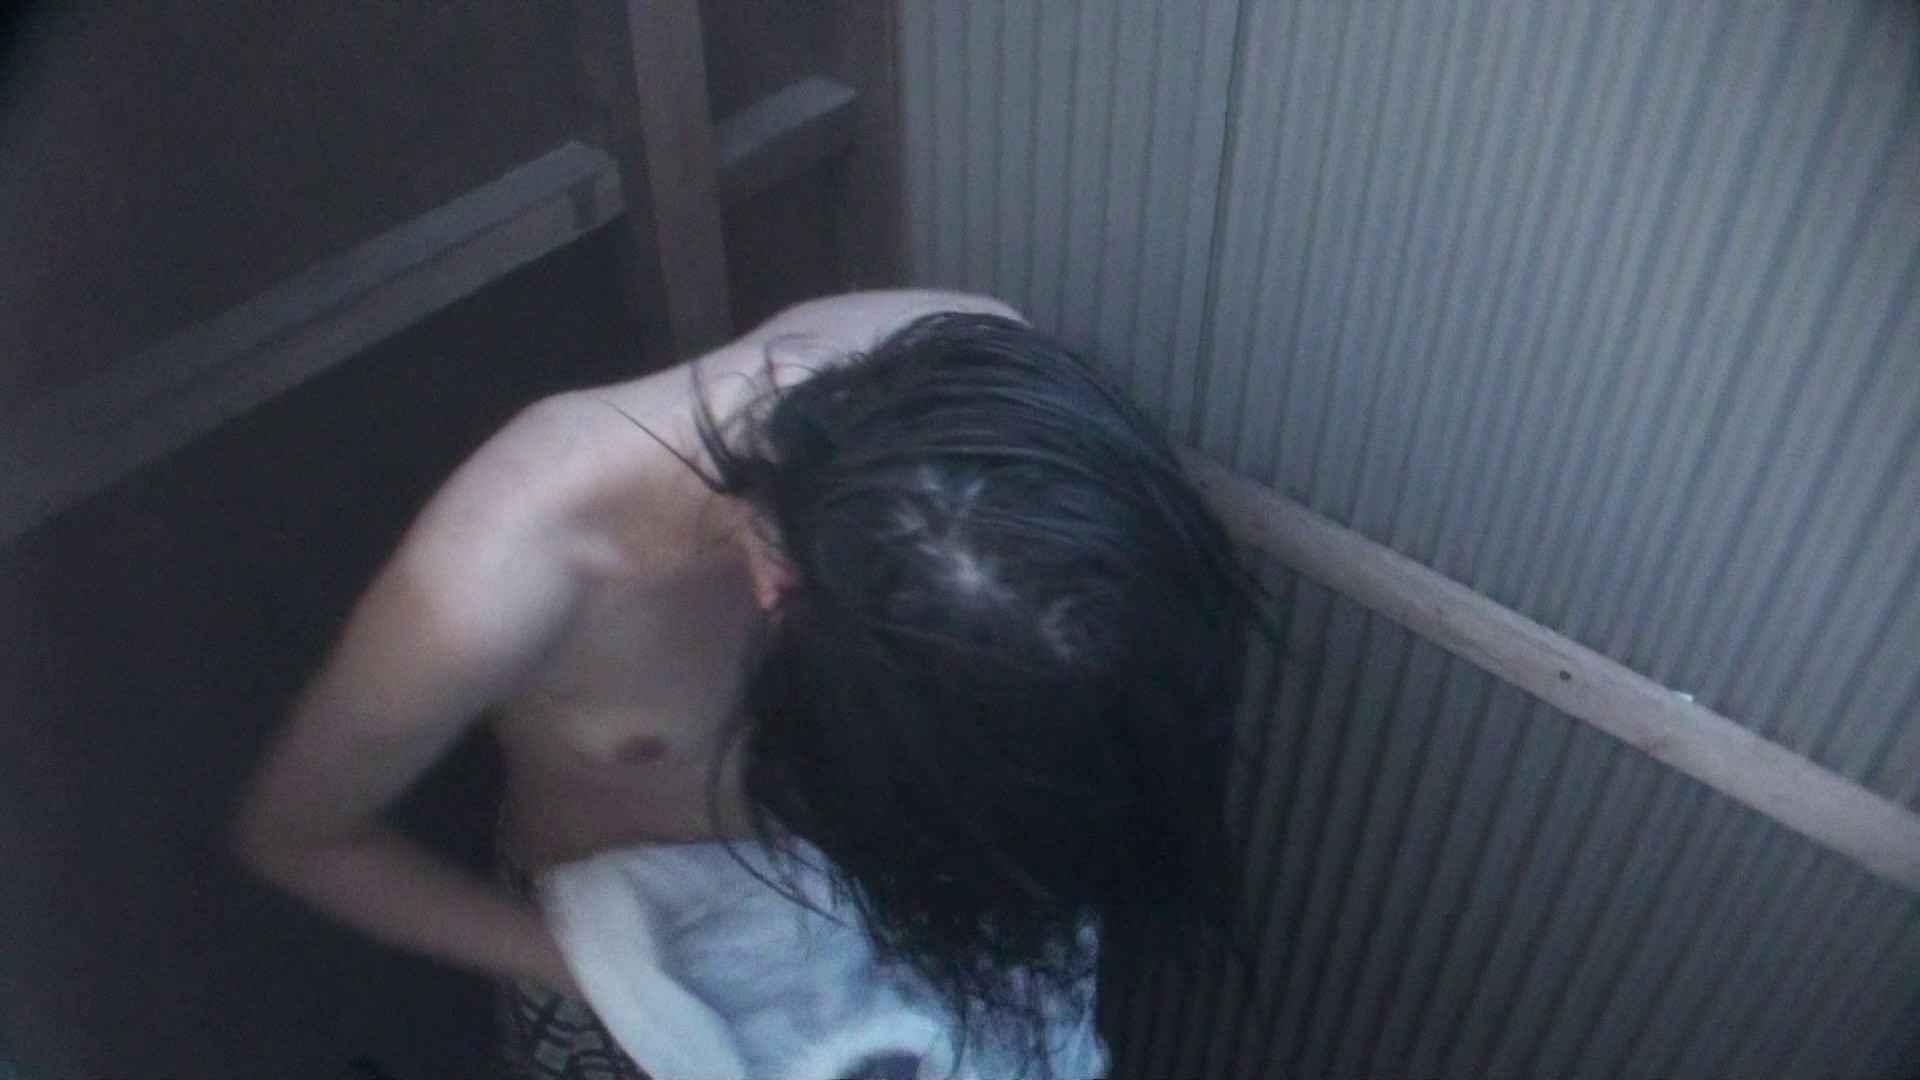 Vol.24 再登場 生理中の年齢不詳嬢 高画質 AV無料 68pic 19